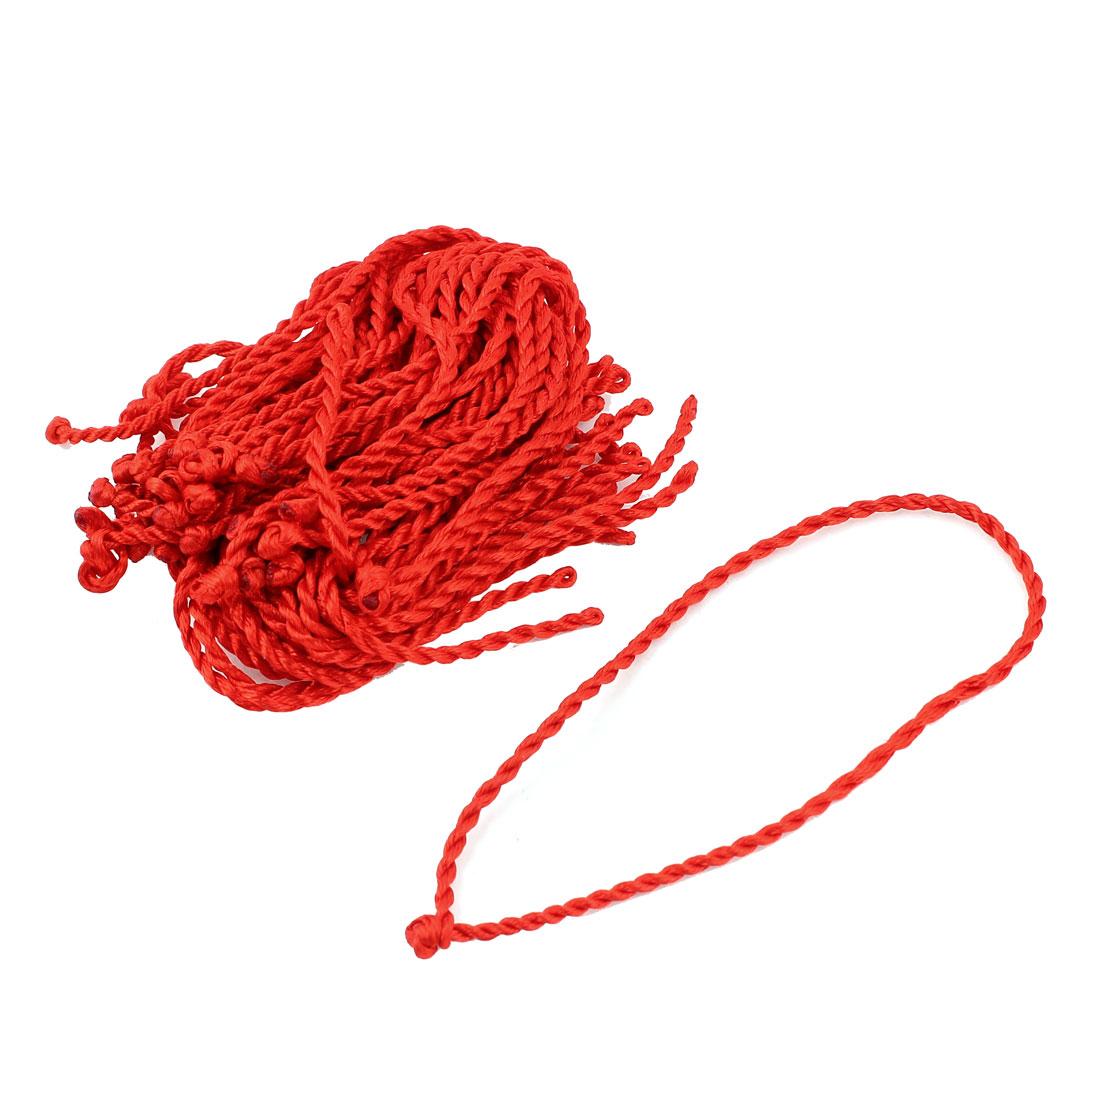 "30pcs 23cm 9"" Long Red Nylon Braided Lucky Knotting Cord DIY Bracelet Wrist Decor String Strap Rope"